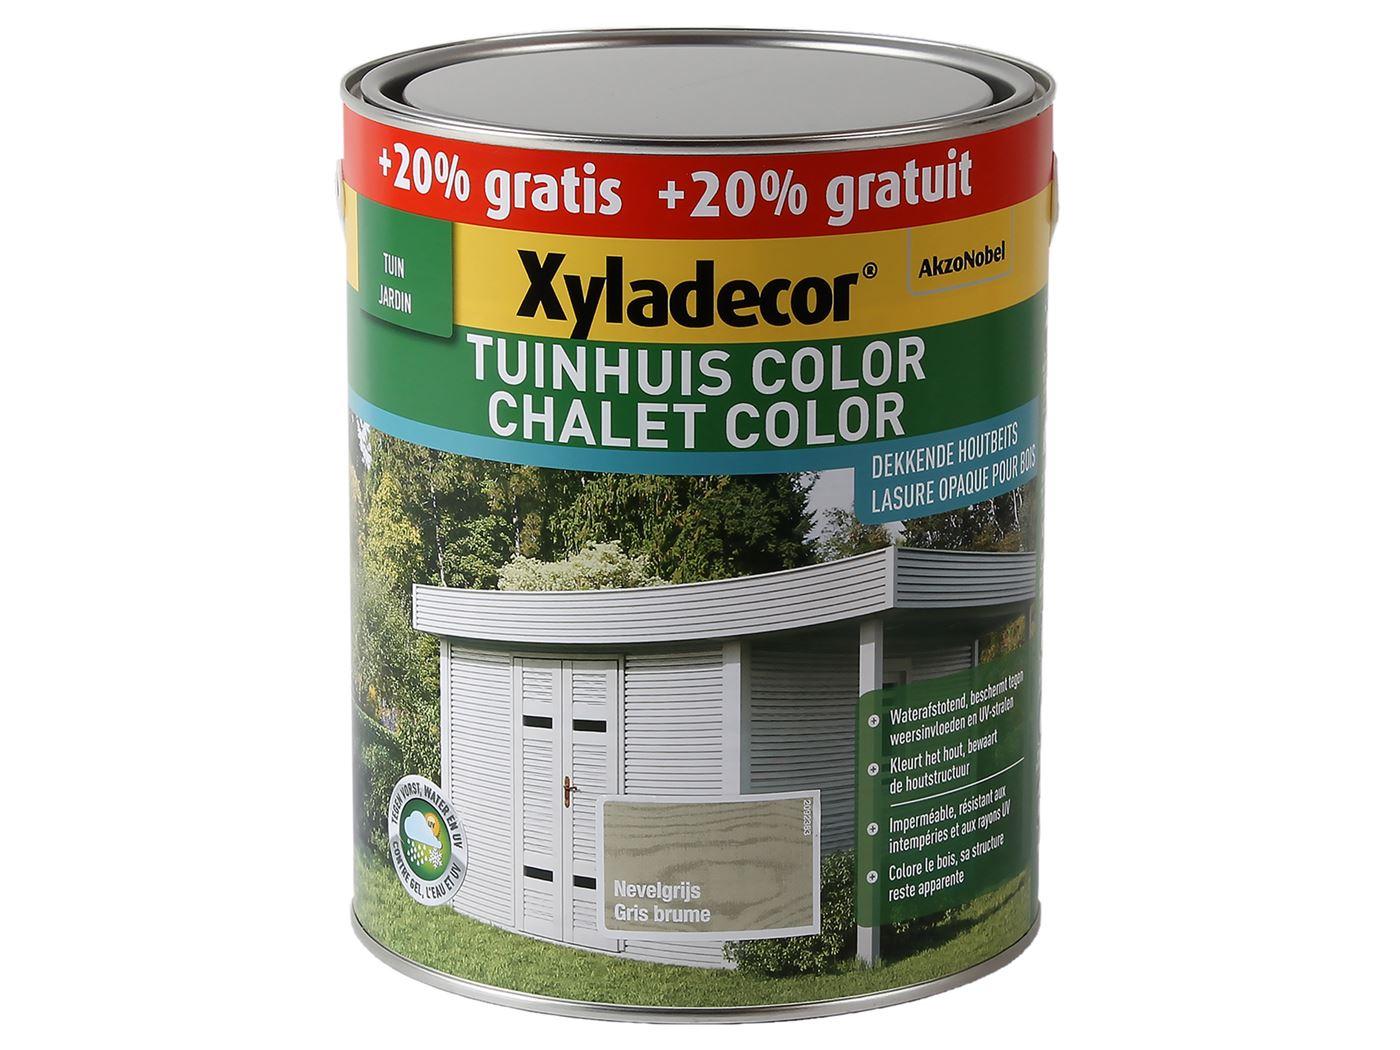 xyladecor tuinhuis color-nevelgrijs